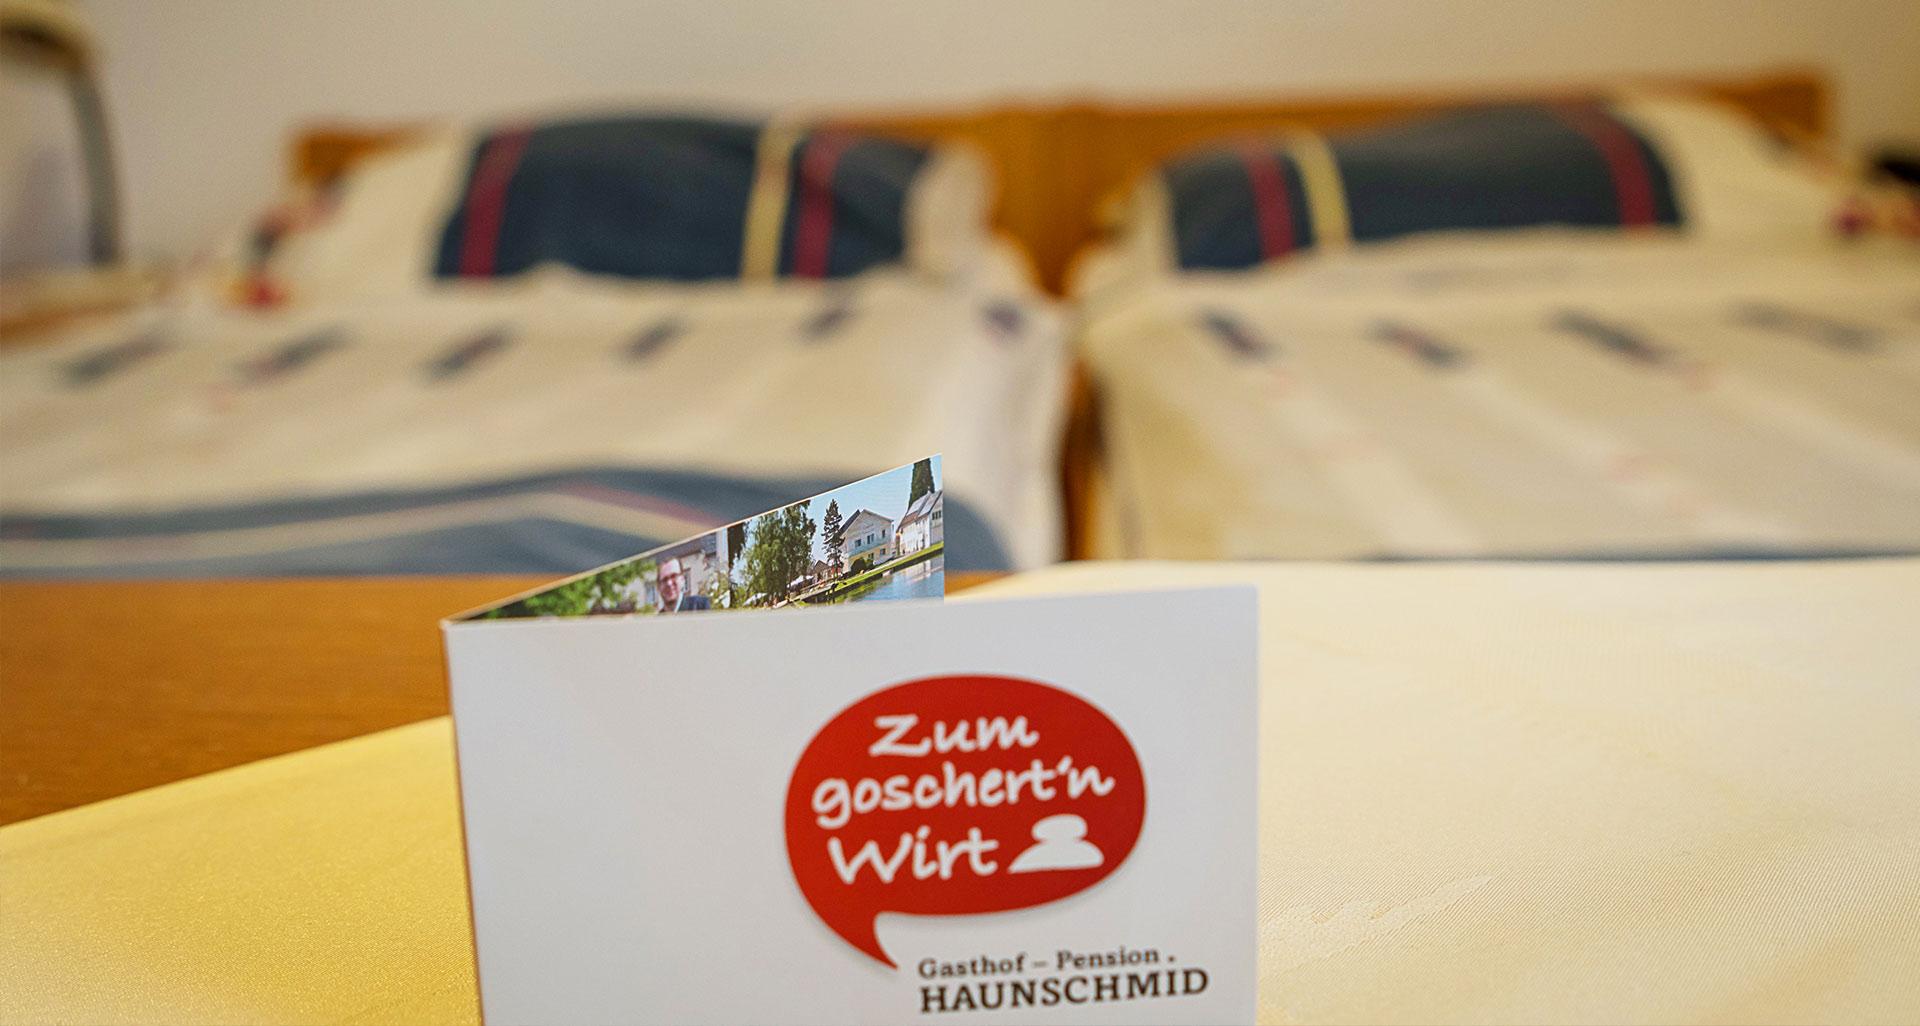 Gasthof Haunschmid